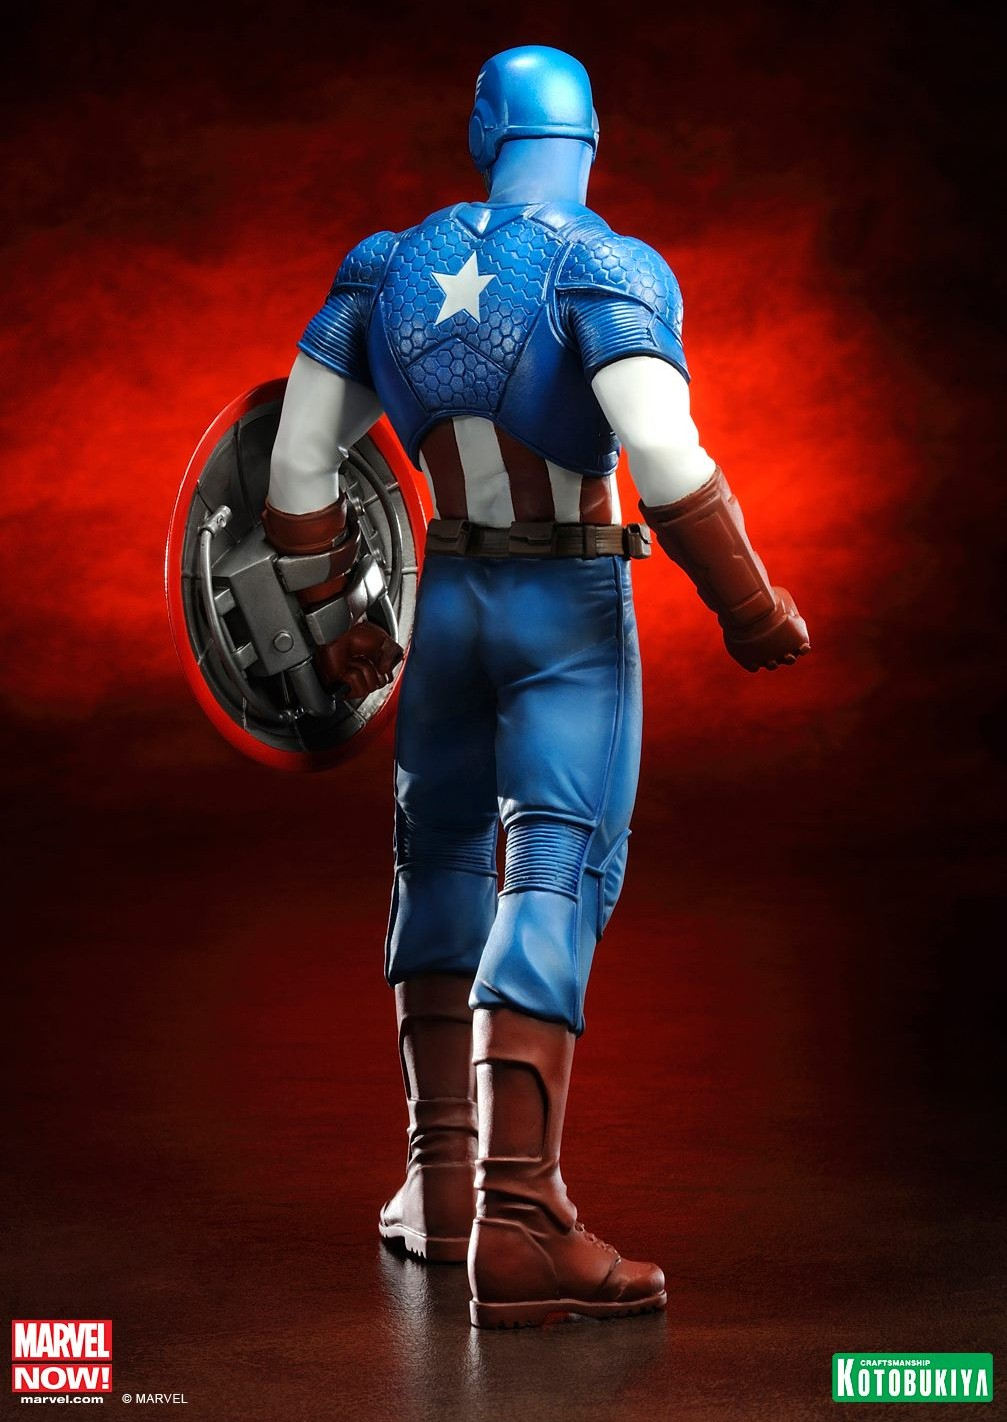 Marvel Kotobukiya Captain America Avengers NOW ArtFX+ Figure Statue